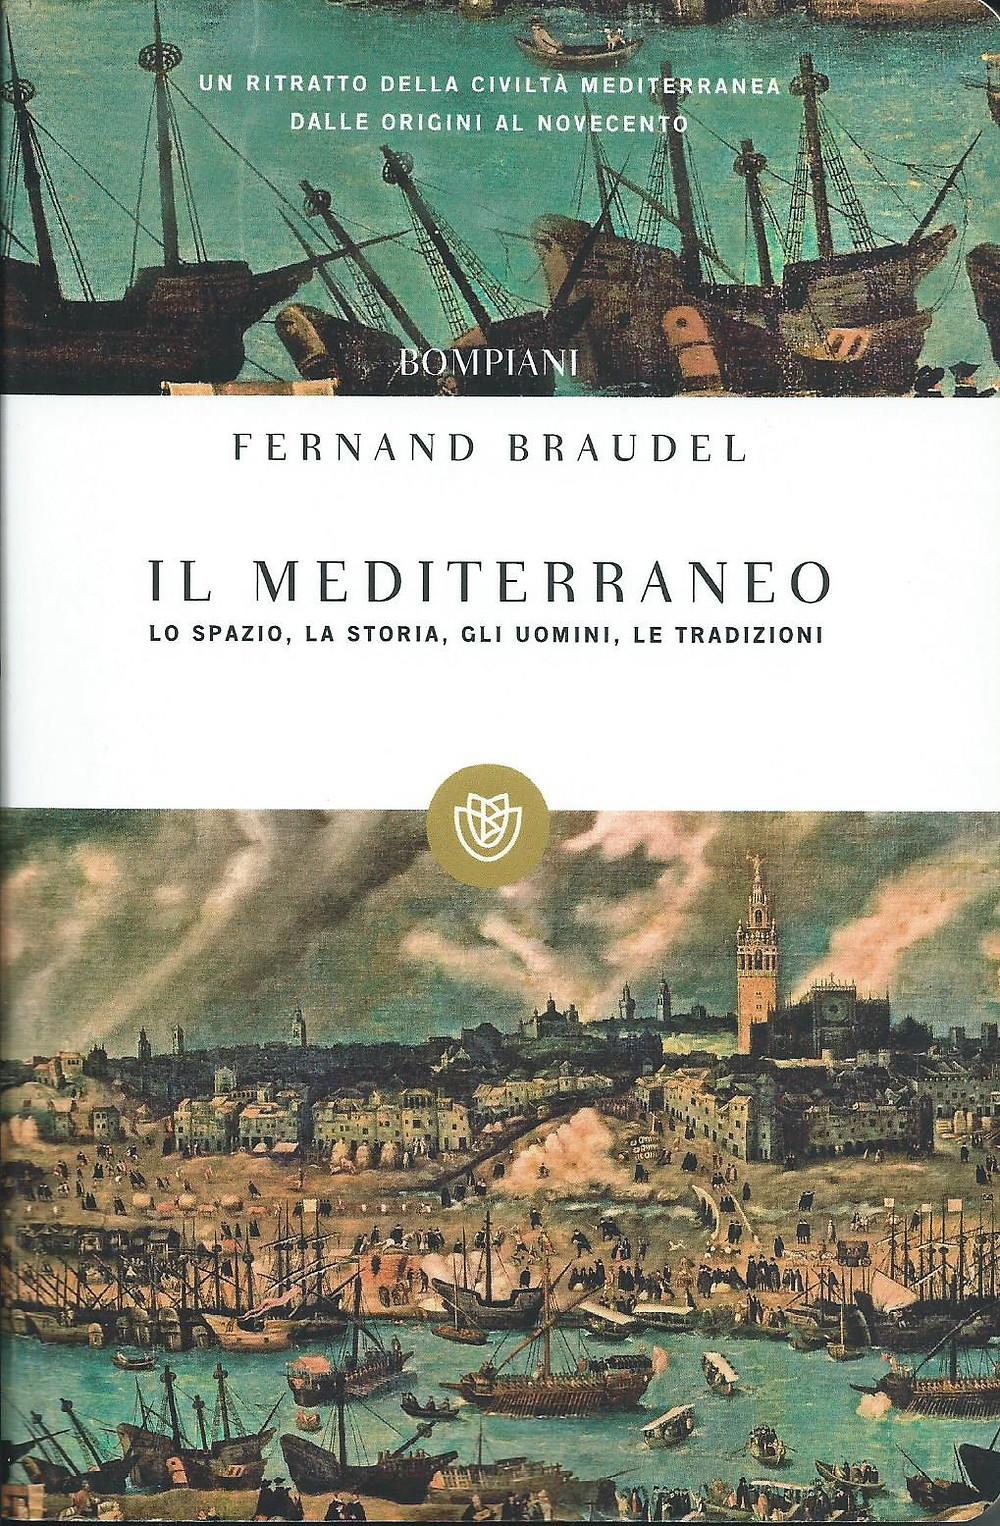 Fernand Braudel, Il Mediterraneo